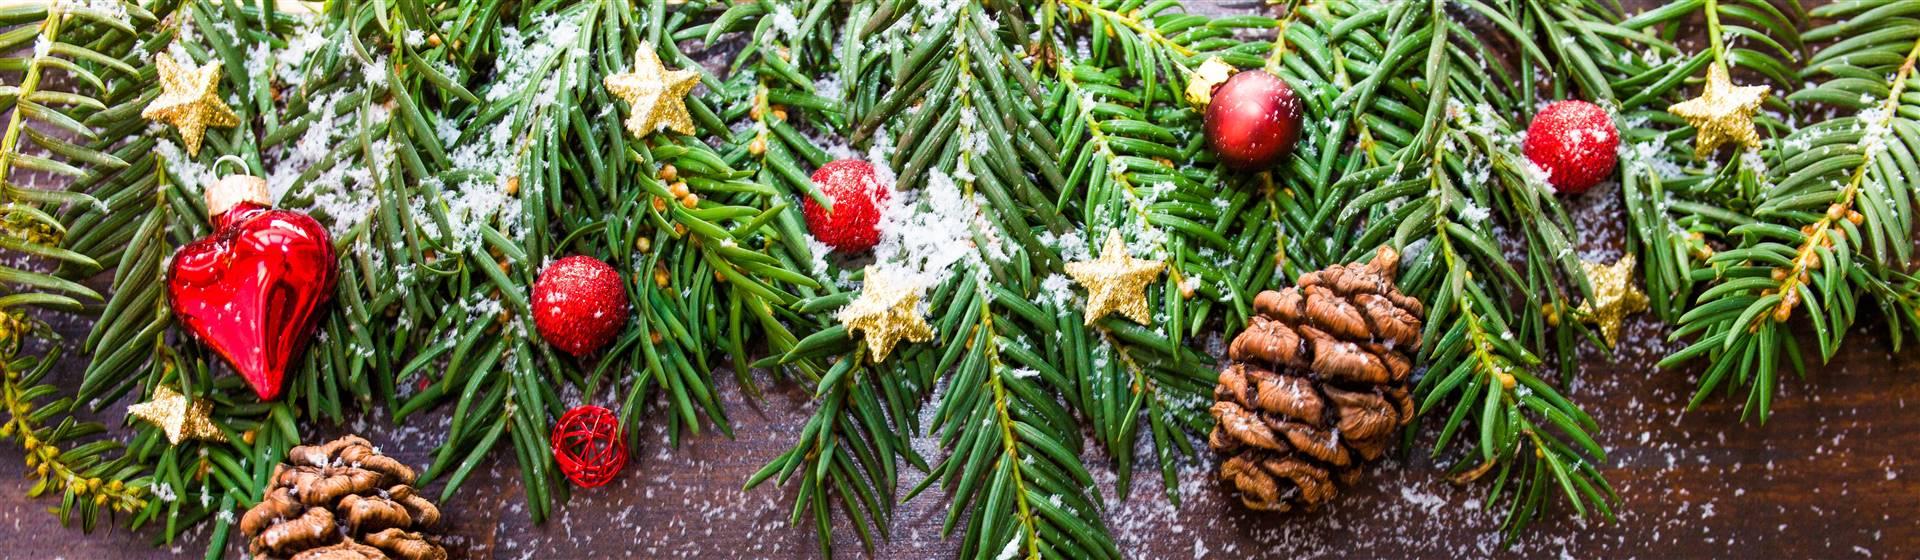 Newquay - Cornish Christmas